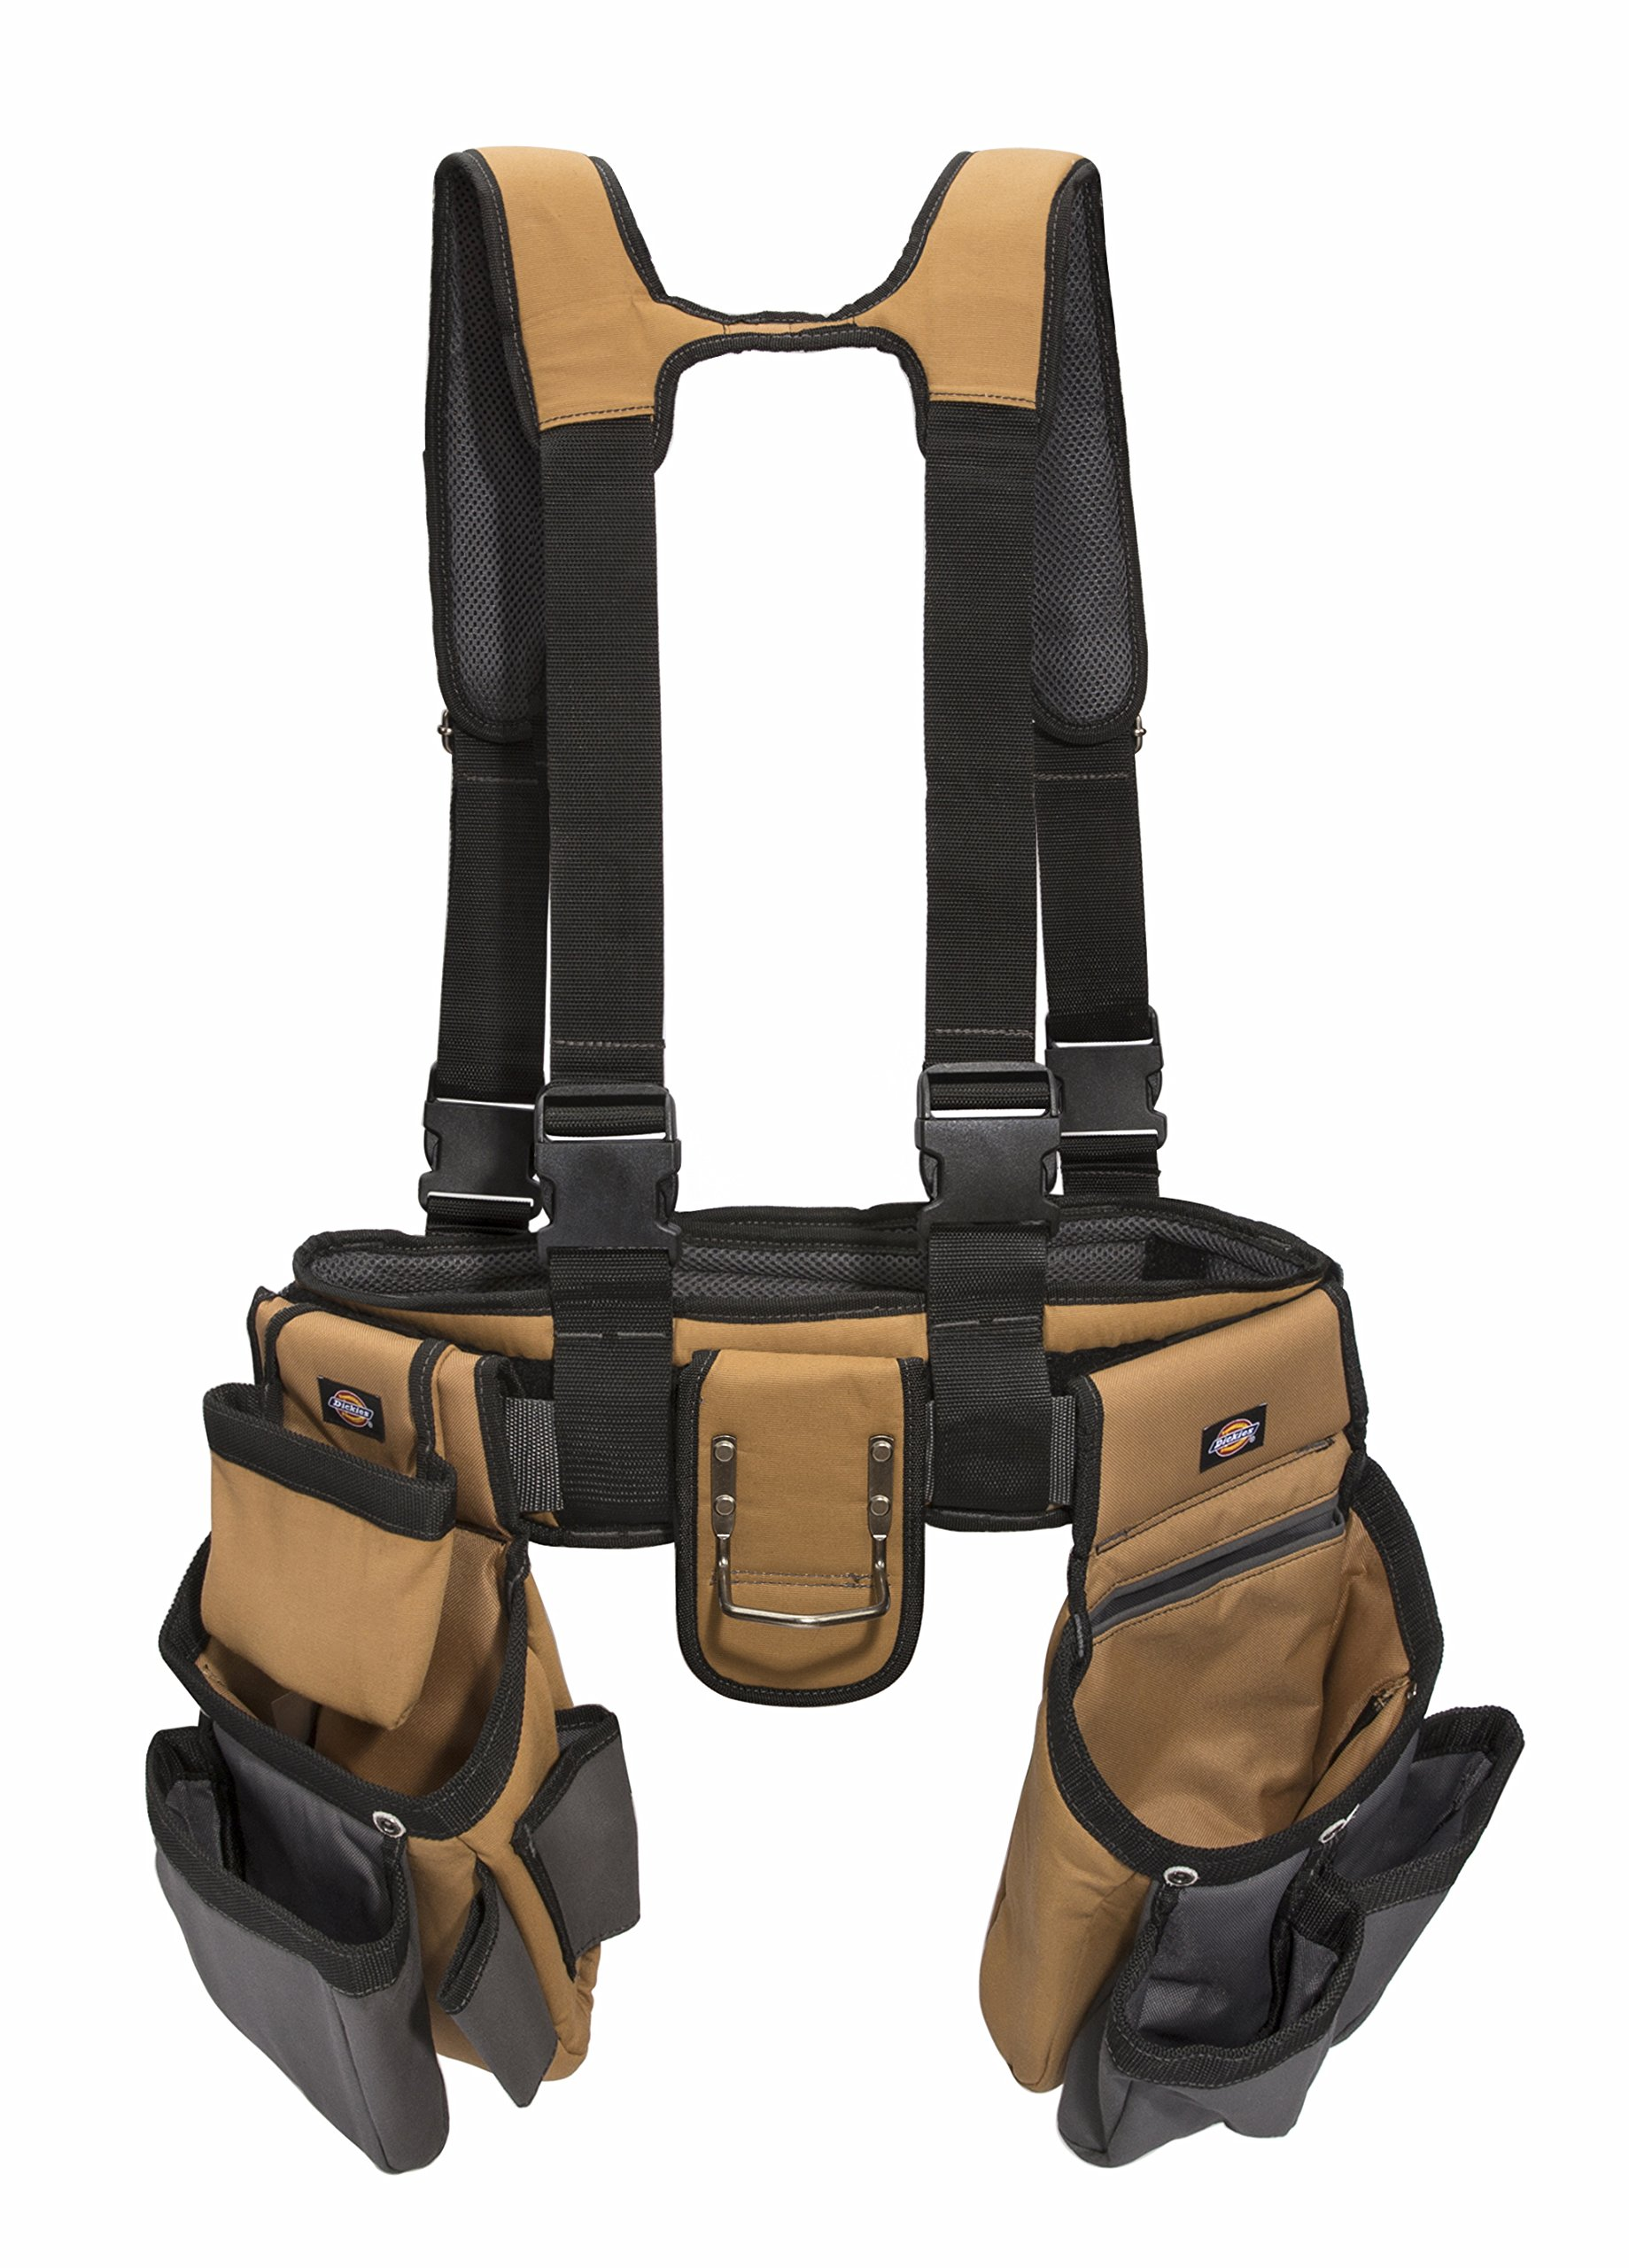 Dickies 4-Piece Carpenter's Rig tool belt